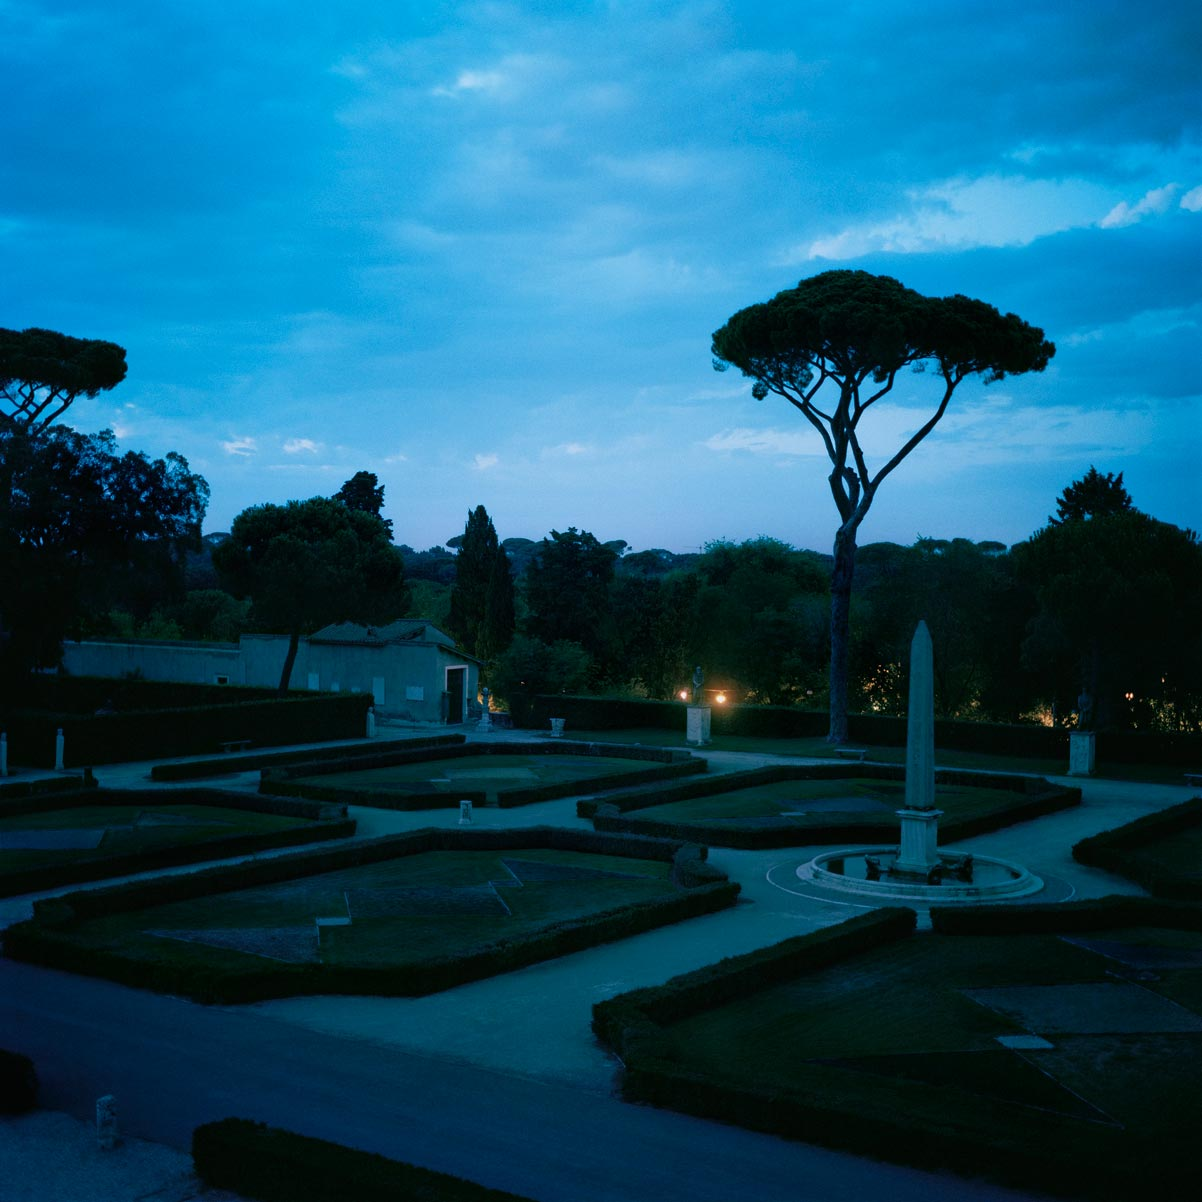 Grand-Tour-Cinecitta-Villa-Medicis-Rome-François-Halard-015